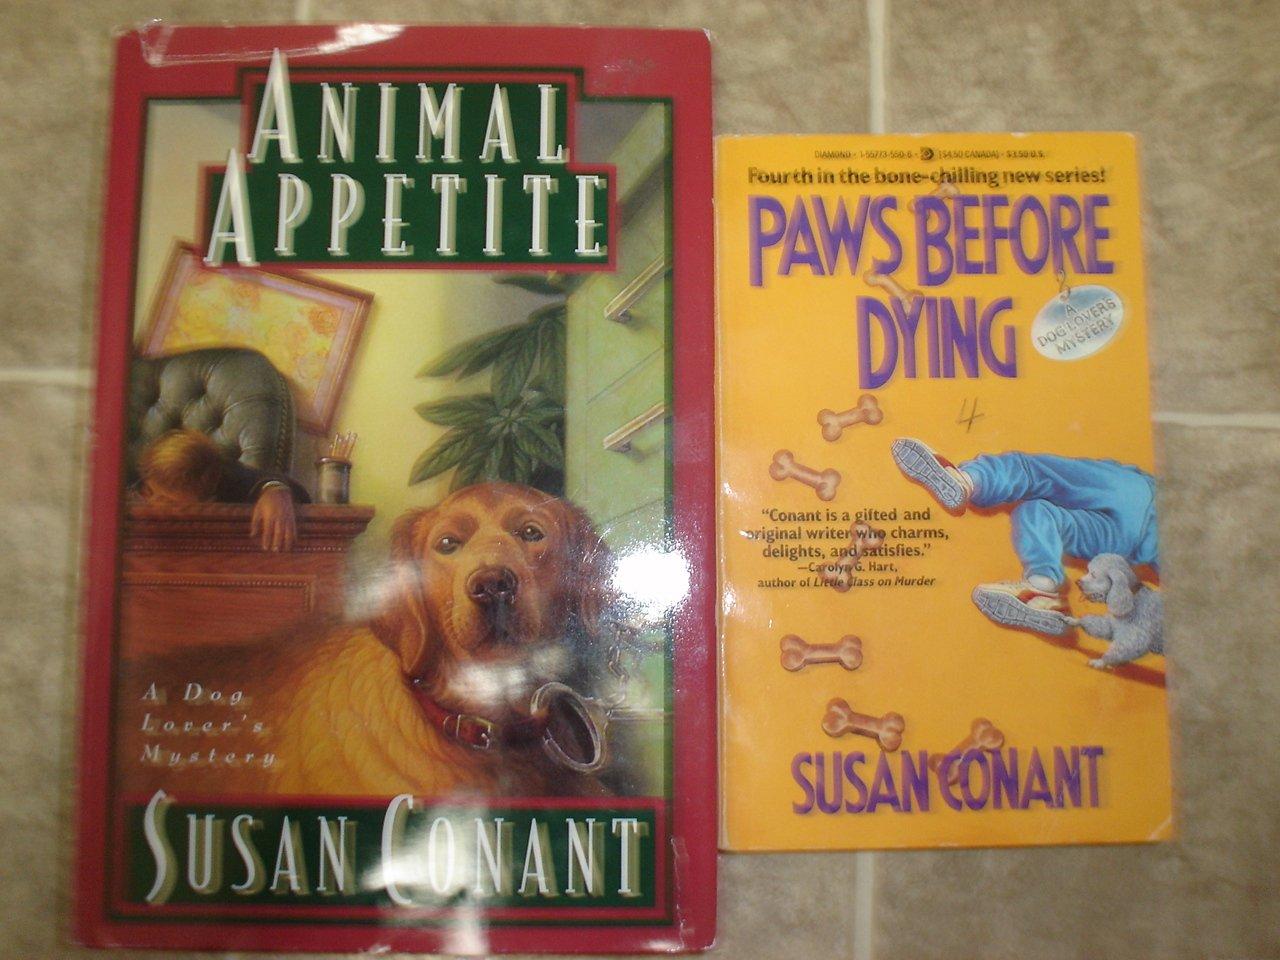 Susan Conant lot of 4 pb hc mystery books cozy dog lovers